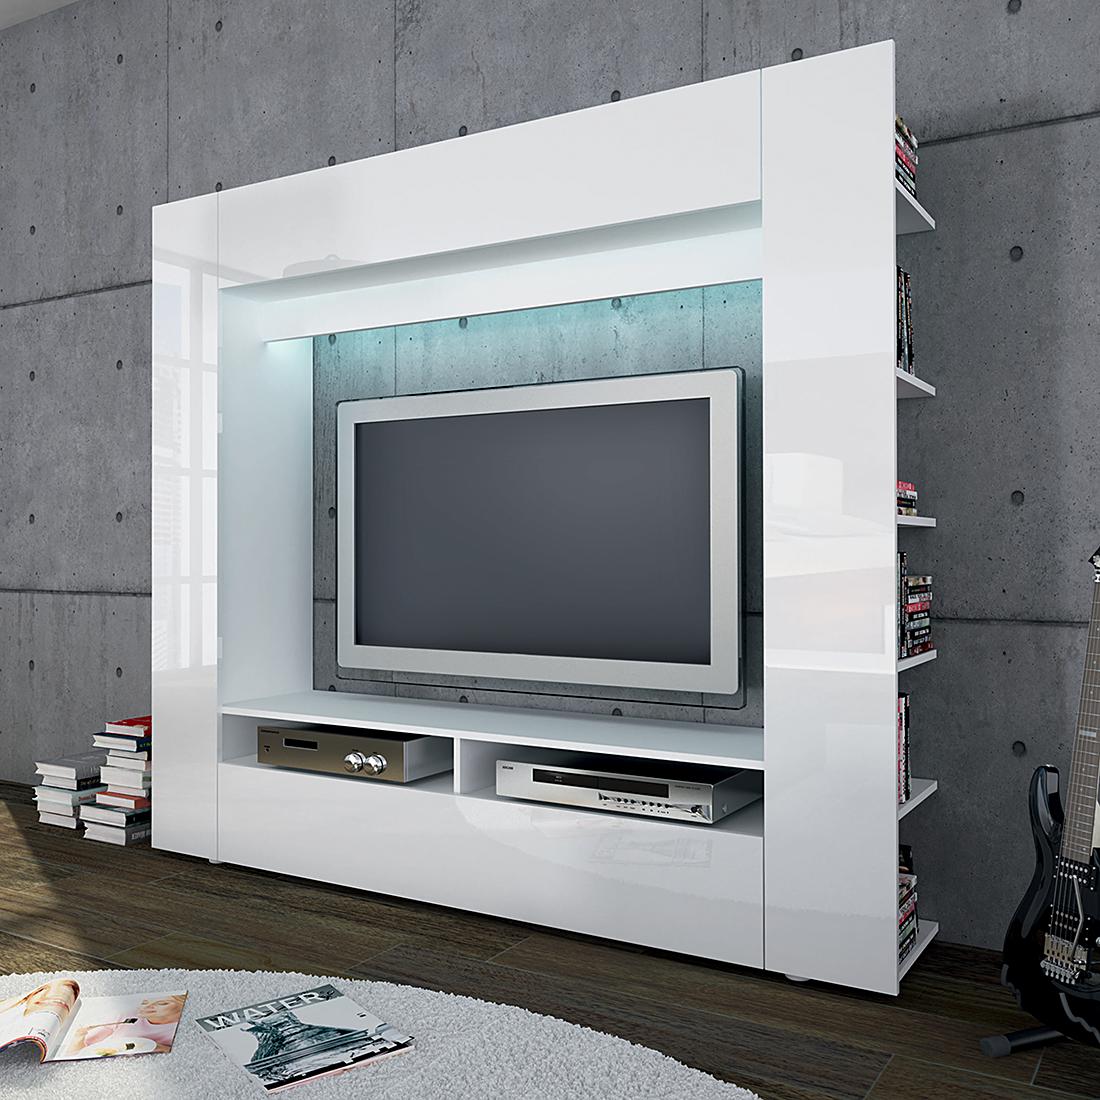 Wohnwand TV-Kommode Lowboard Sideboard Board Regal Weiß Hochglanz ...